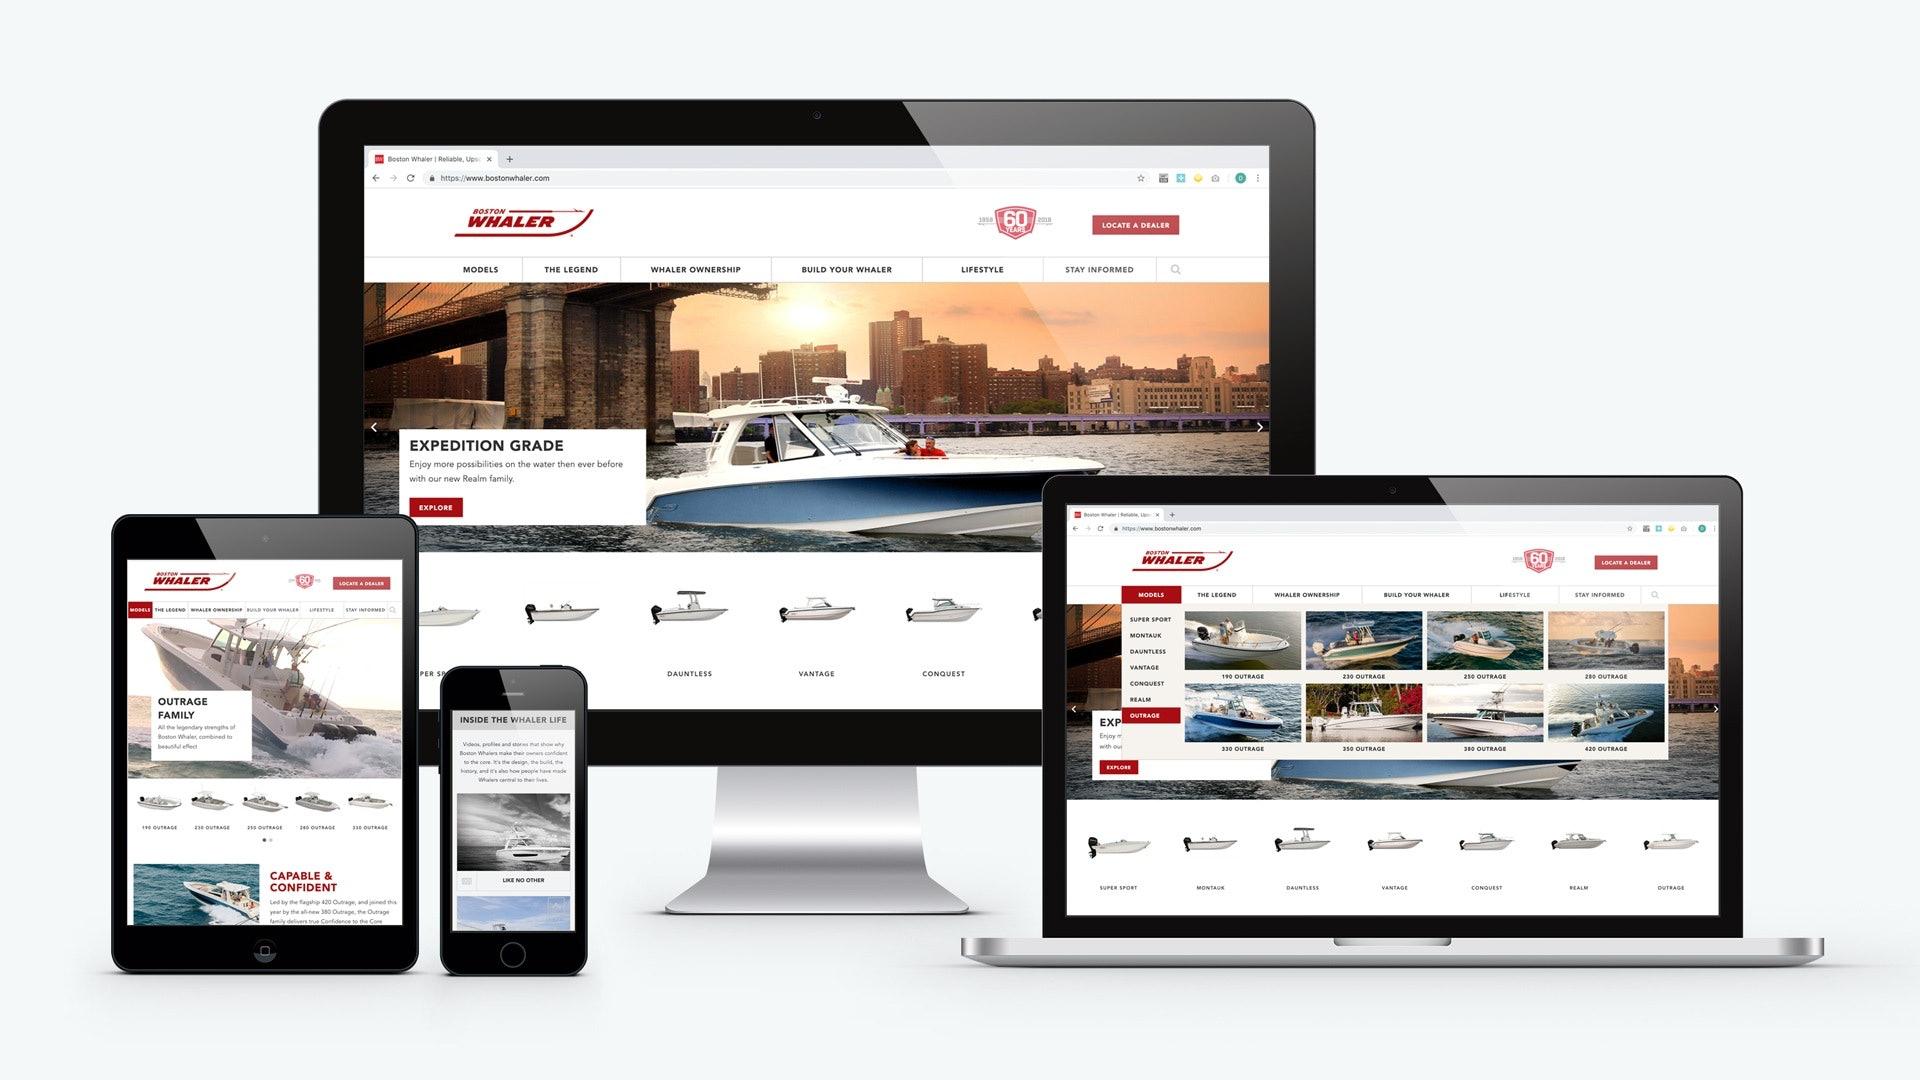 boston whaler website redesign on desktop, laptop, ipad, and iphone screens